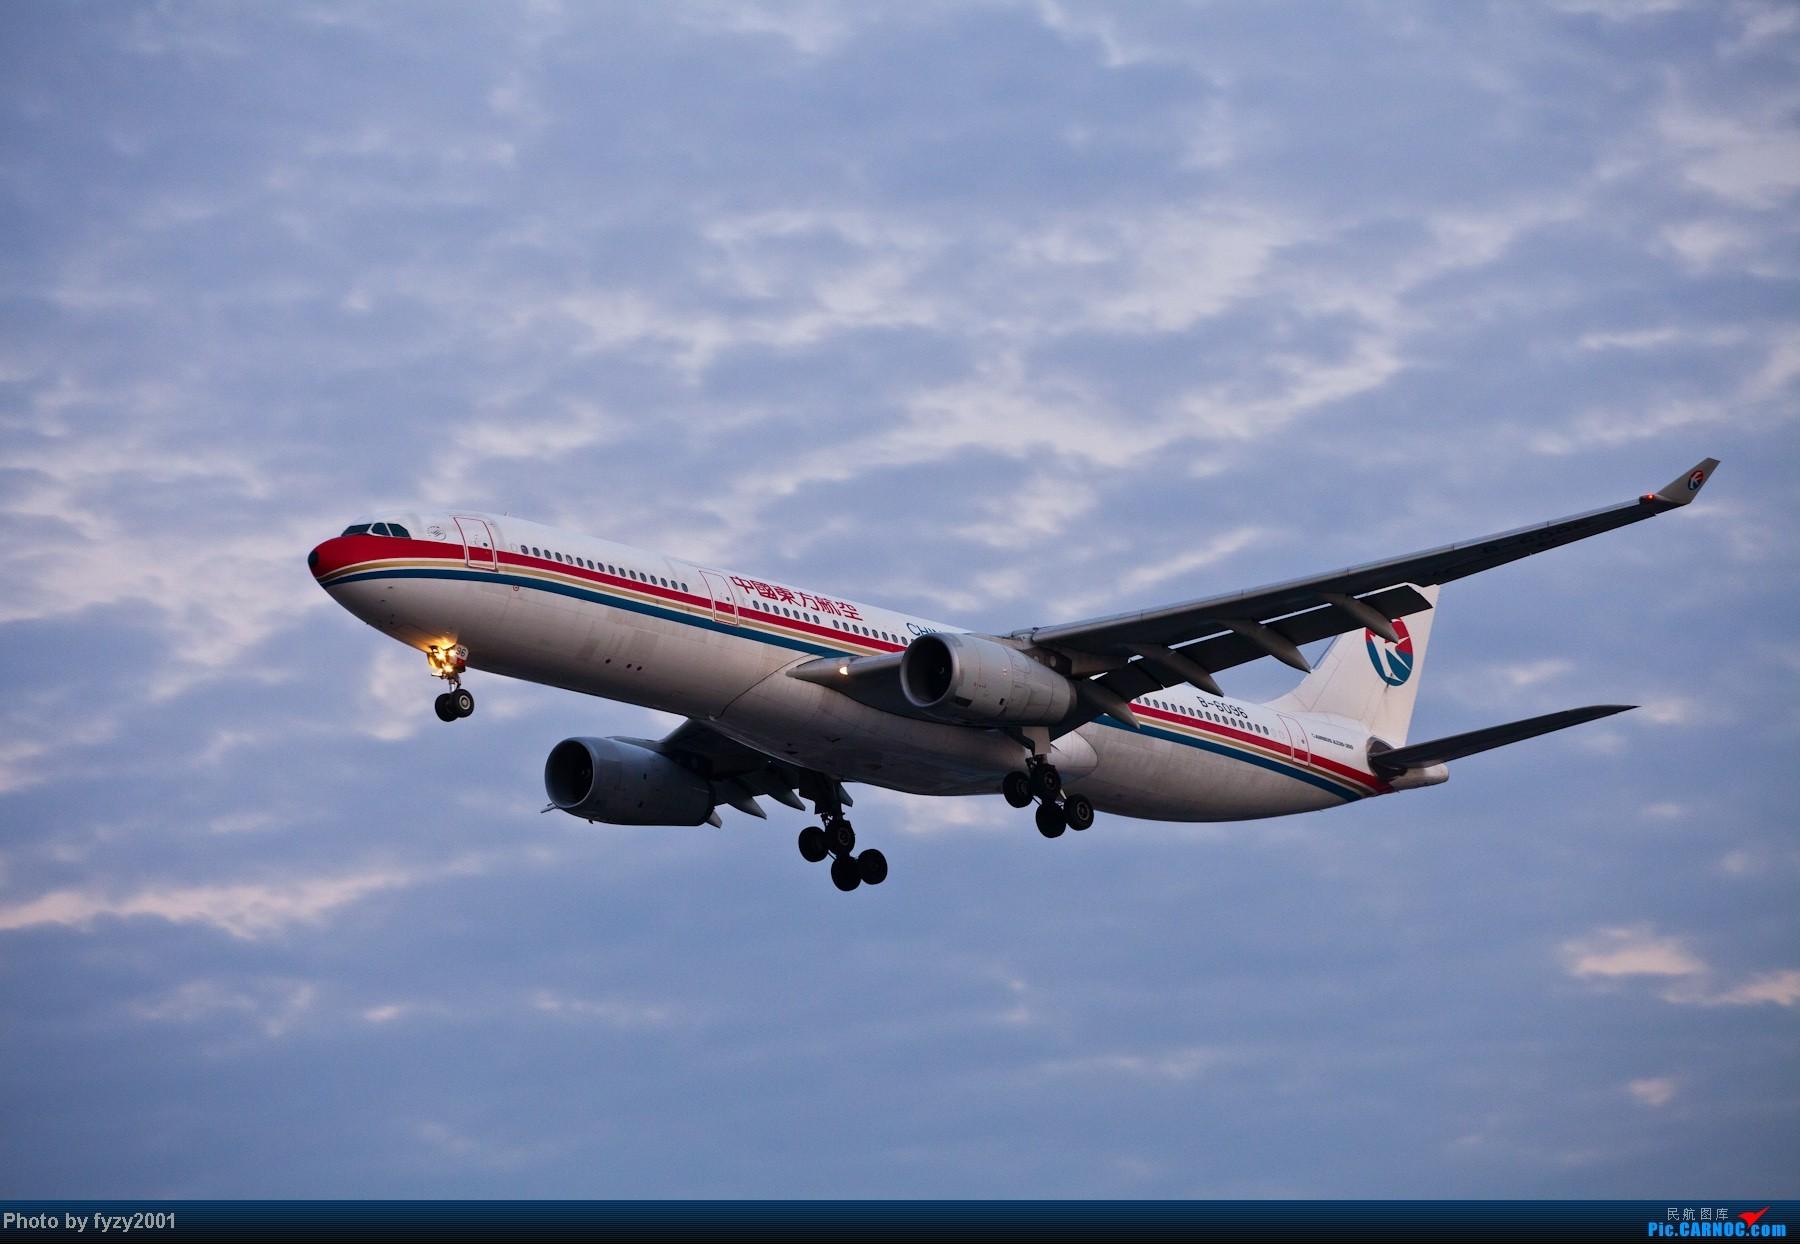 Re:[原创][无锡西站]追逐光影的脚步(1800大图) AIRBUS A330-300 B-6096 中国上海虹桥机场